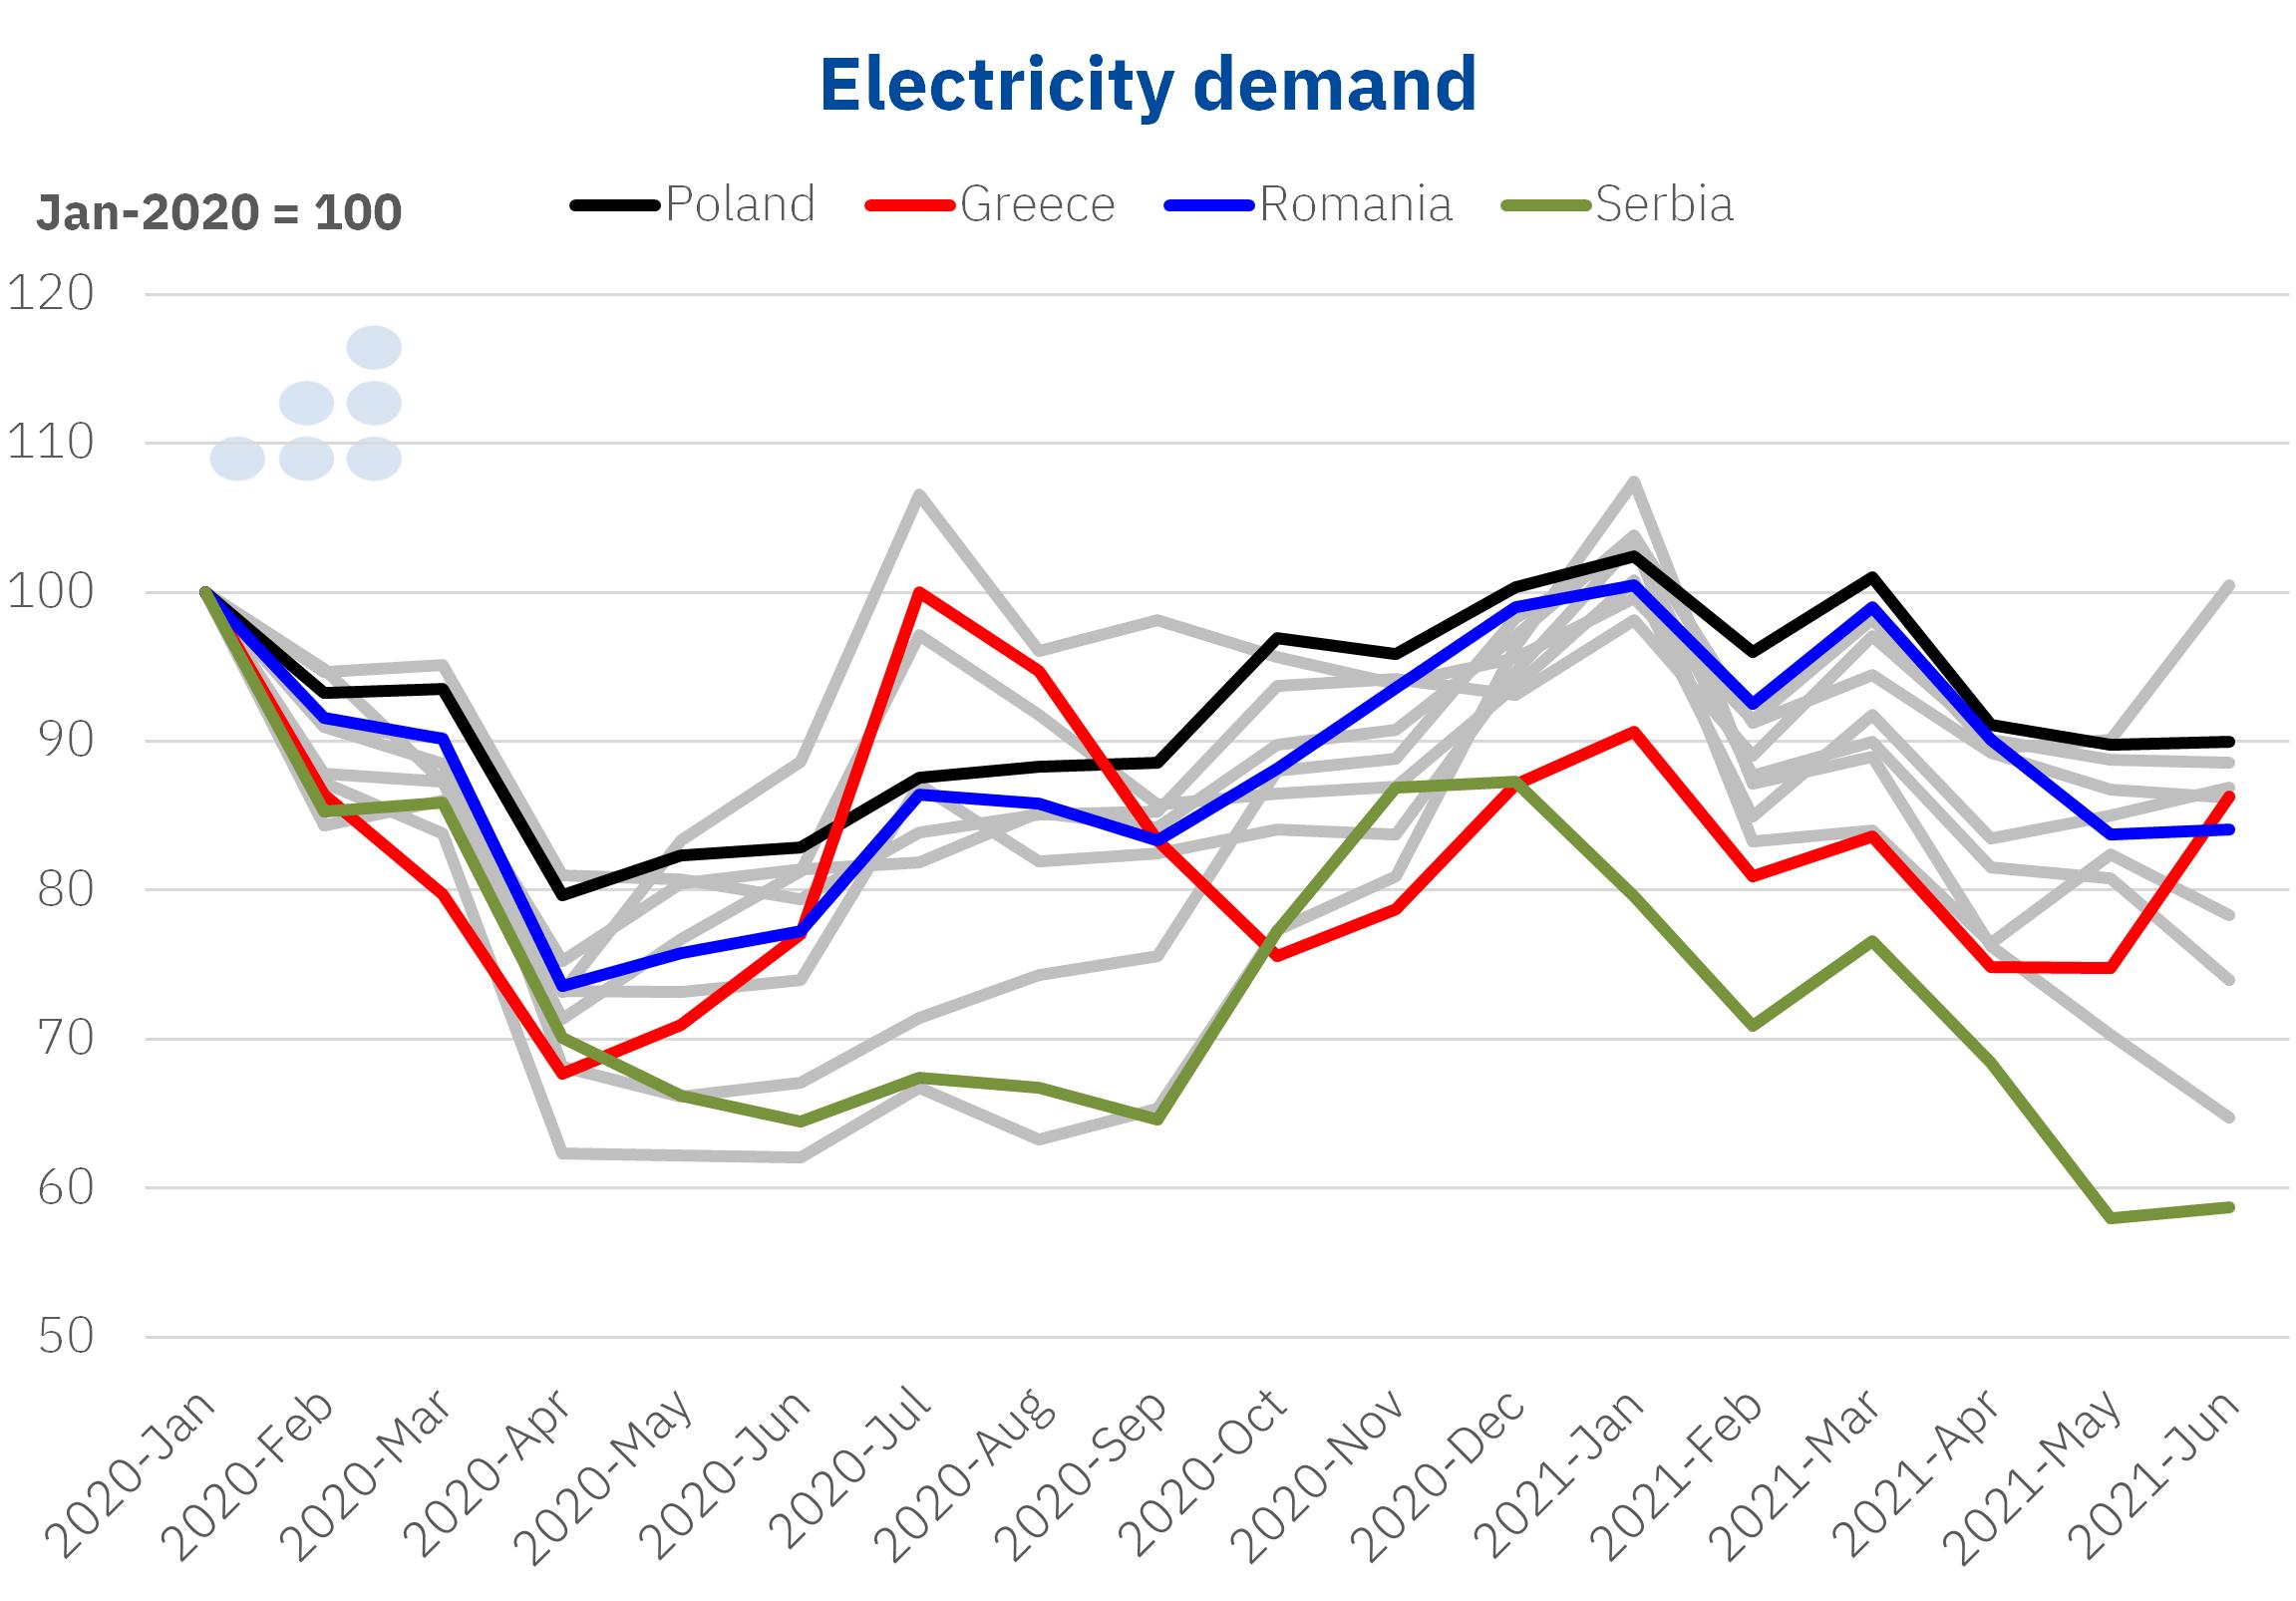 AleaSoft - electricity demand poland greece romania serbia